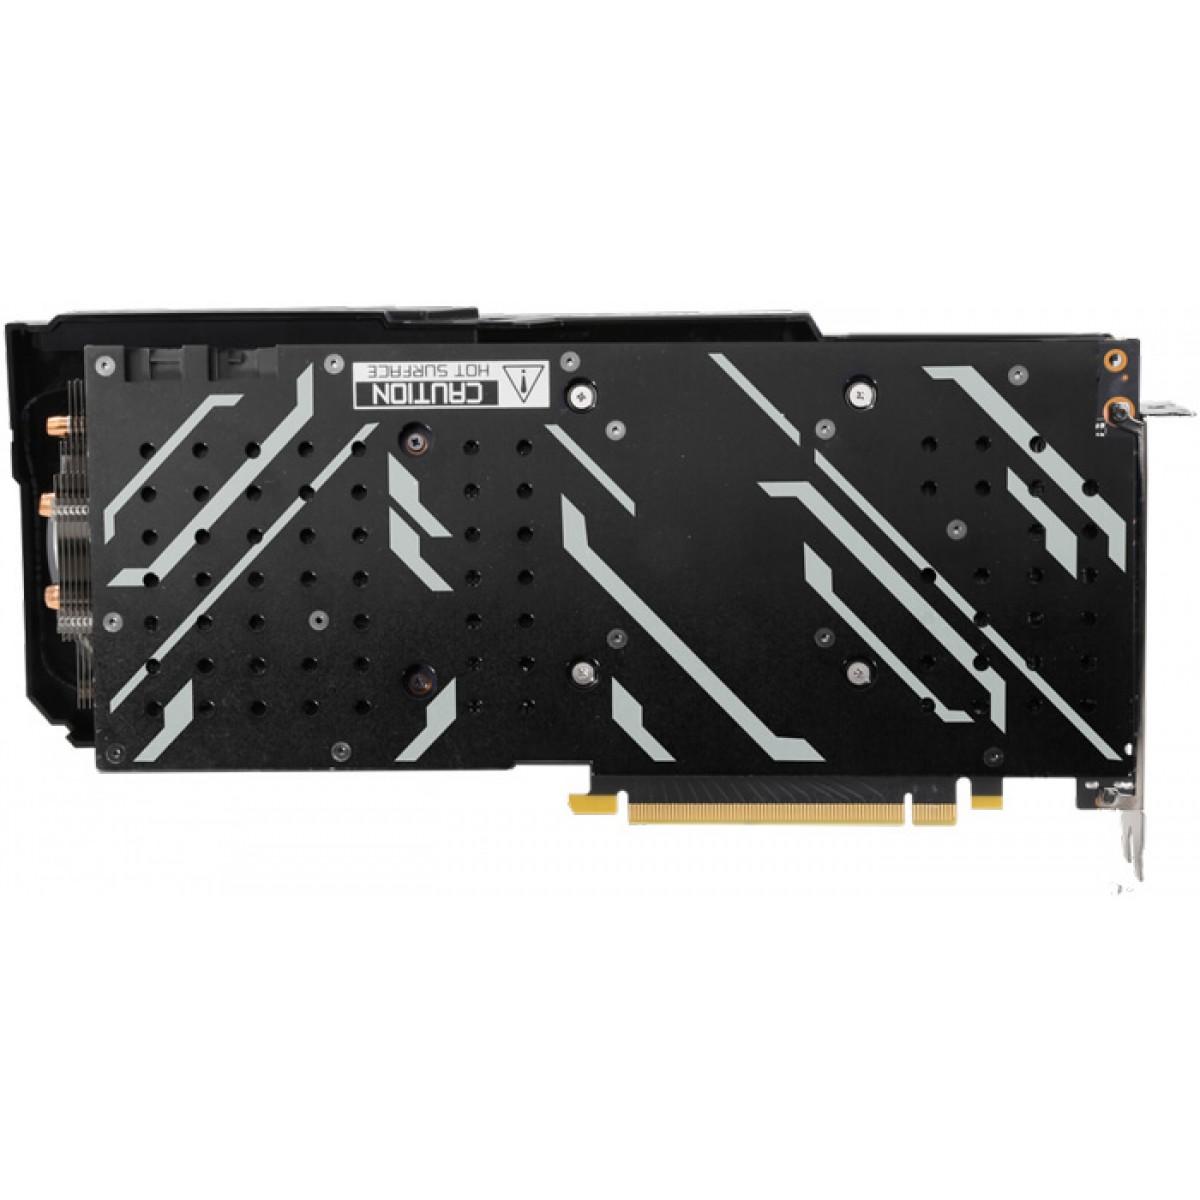 Placa de Vídeo Galax GeForce RTX 2070 Super EX Gamer Black, 8GB GDDR6, 256Bit, 27ISL6MDW0BG